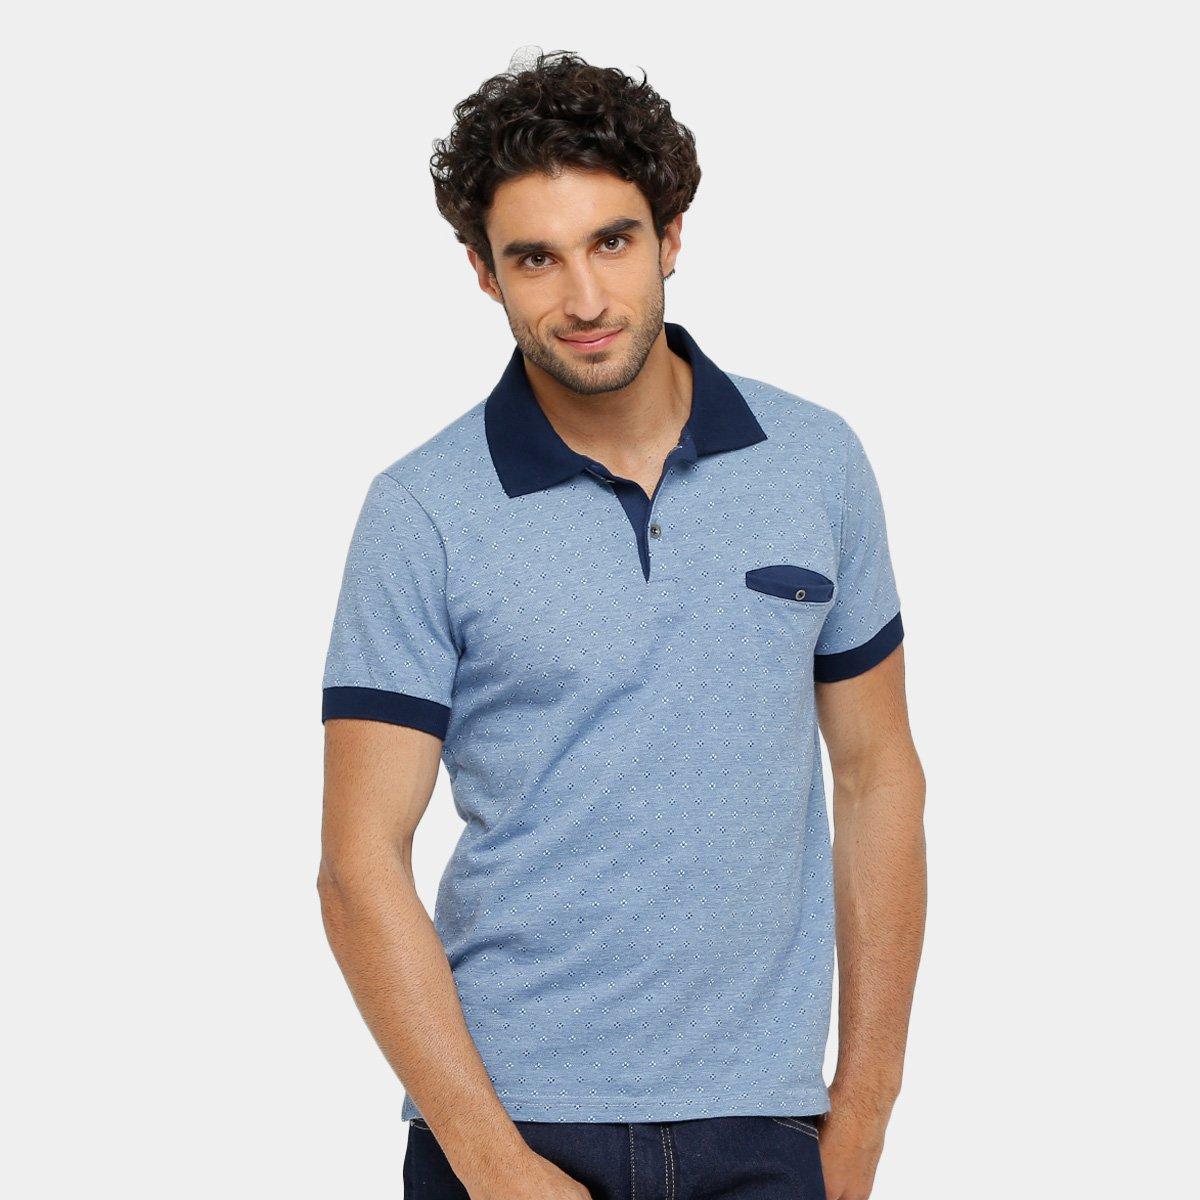 3411504c2e Camisa Polo Local Jaquard Bolso Embutido Masculina